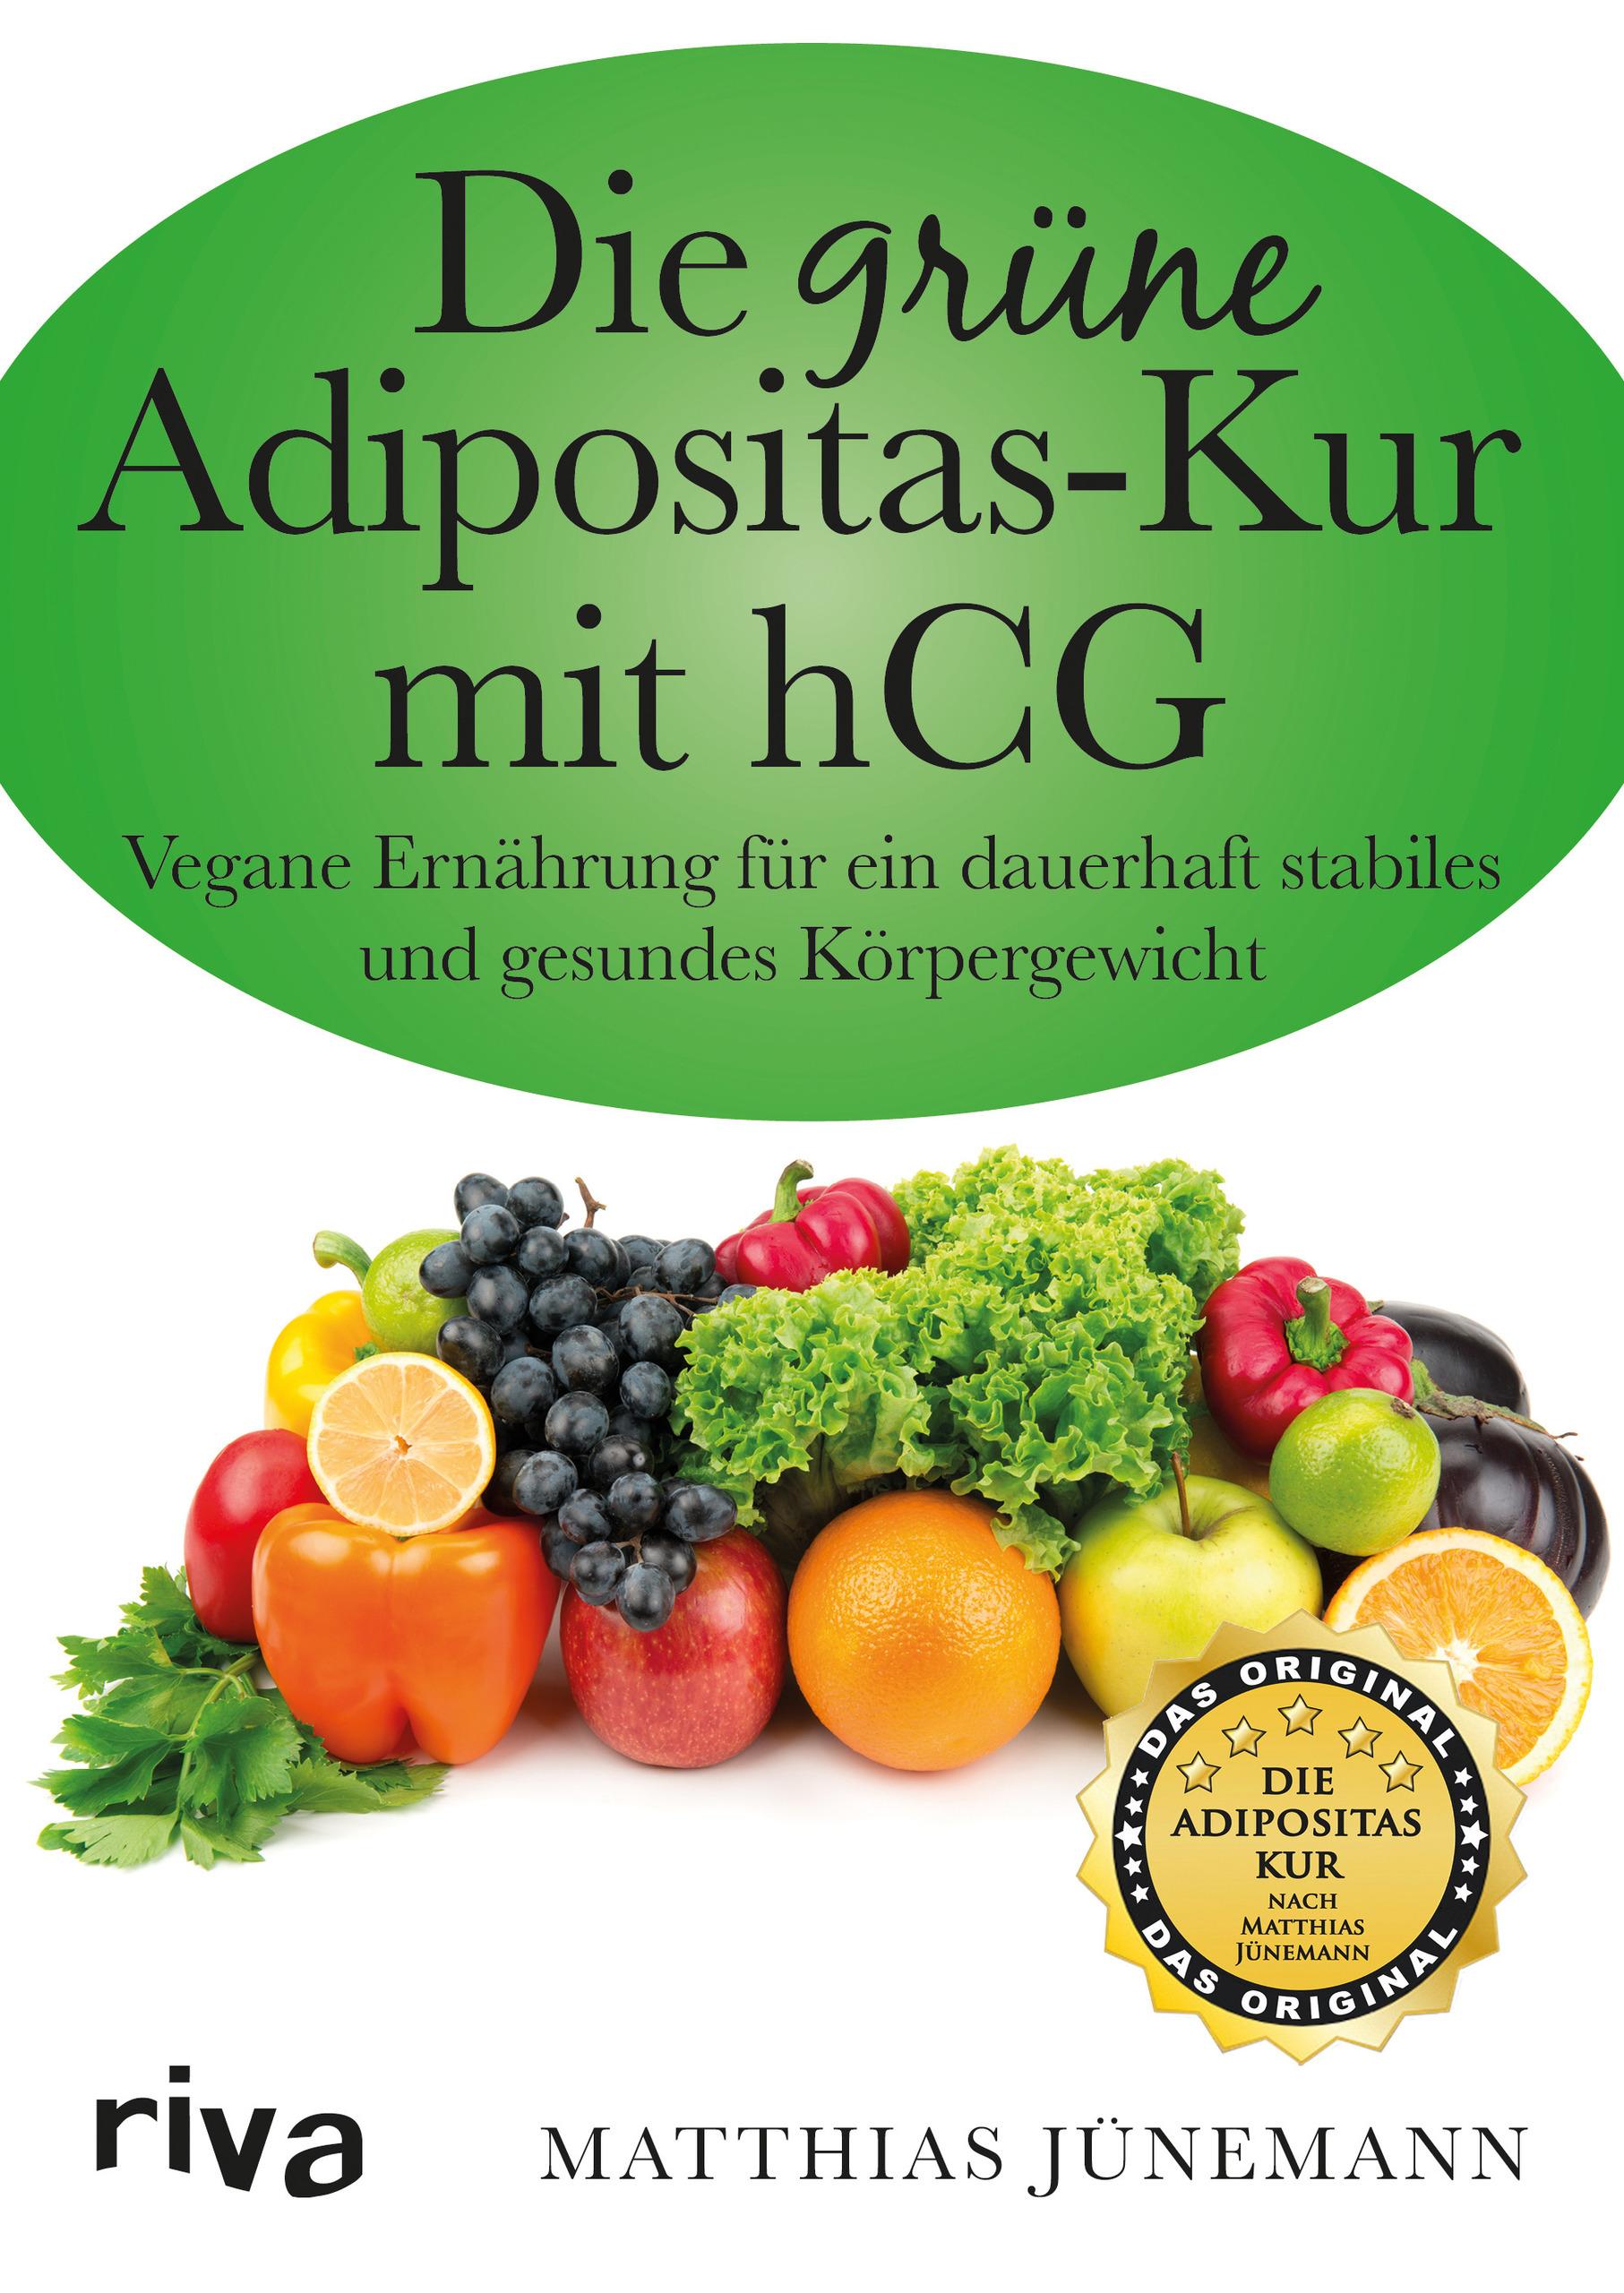 Die grüne Adipositas-Kur mit hCG (Buch)